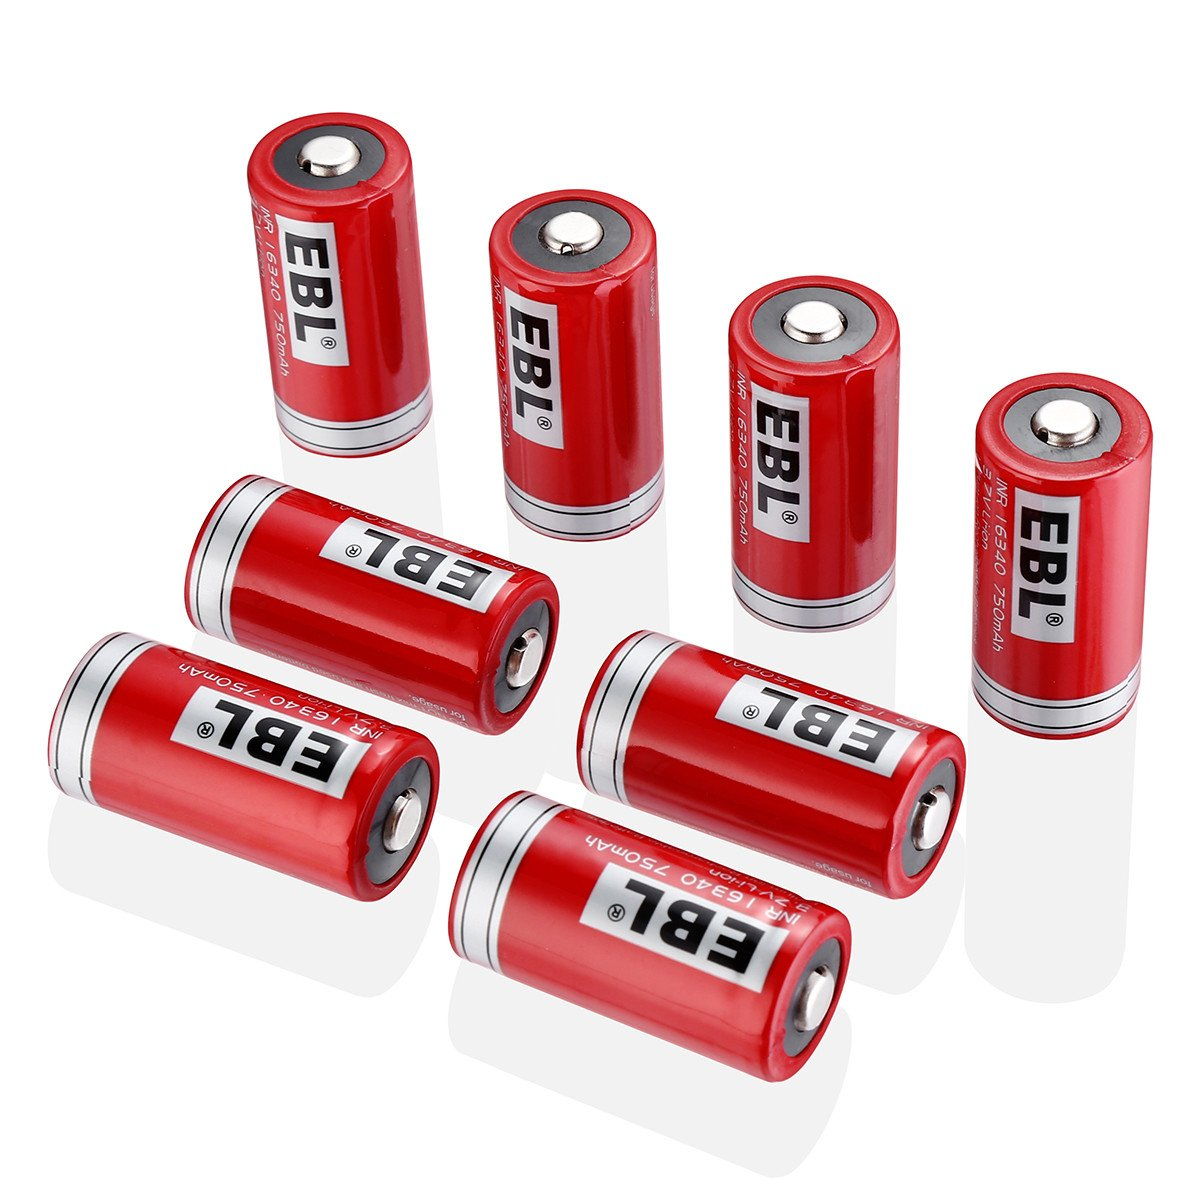 EBL RCR123A Rechargeable Batteries (8-Pack) Li-ion 3.7V Battery Arlo Wireless Security Cameras (VMC3030/VMK3200/VMS3330/3430/3530)